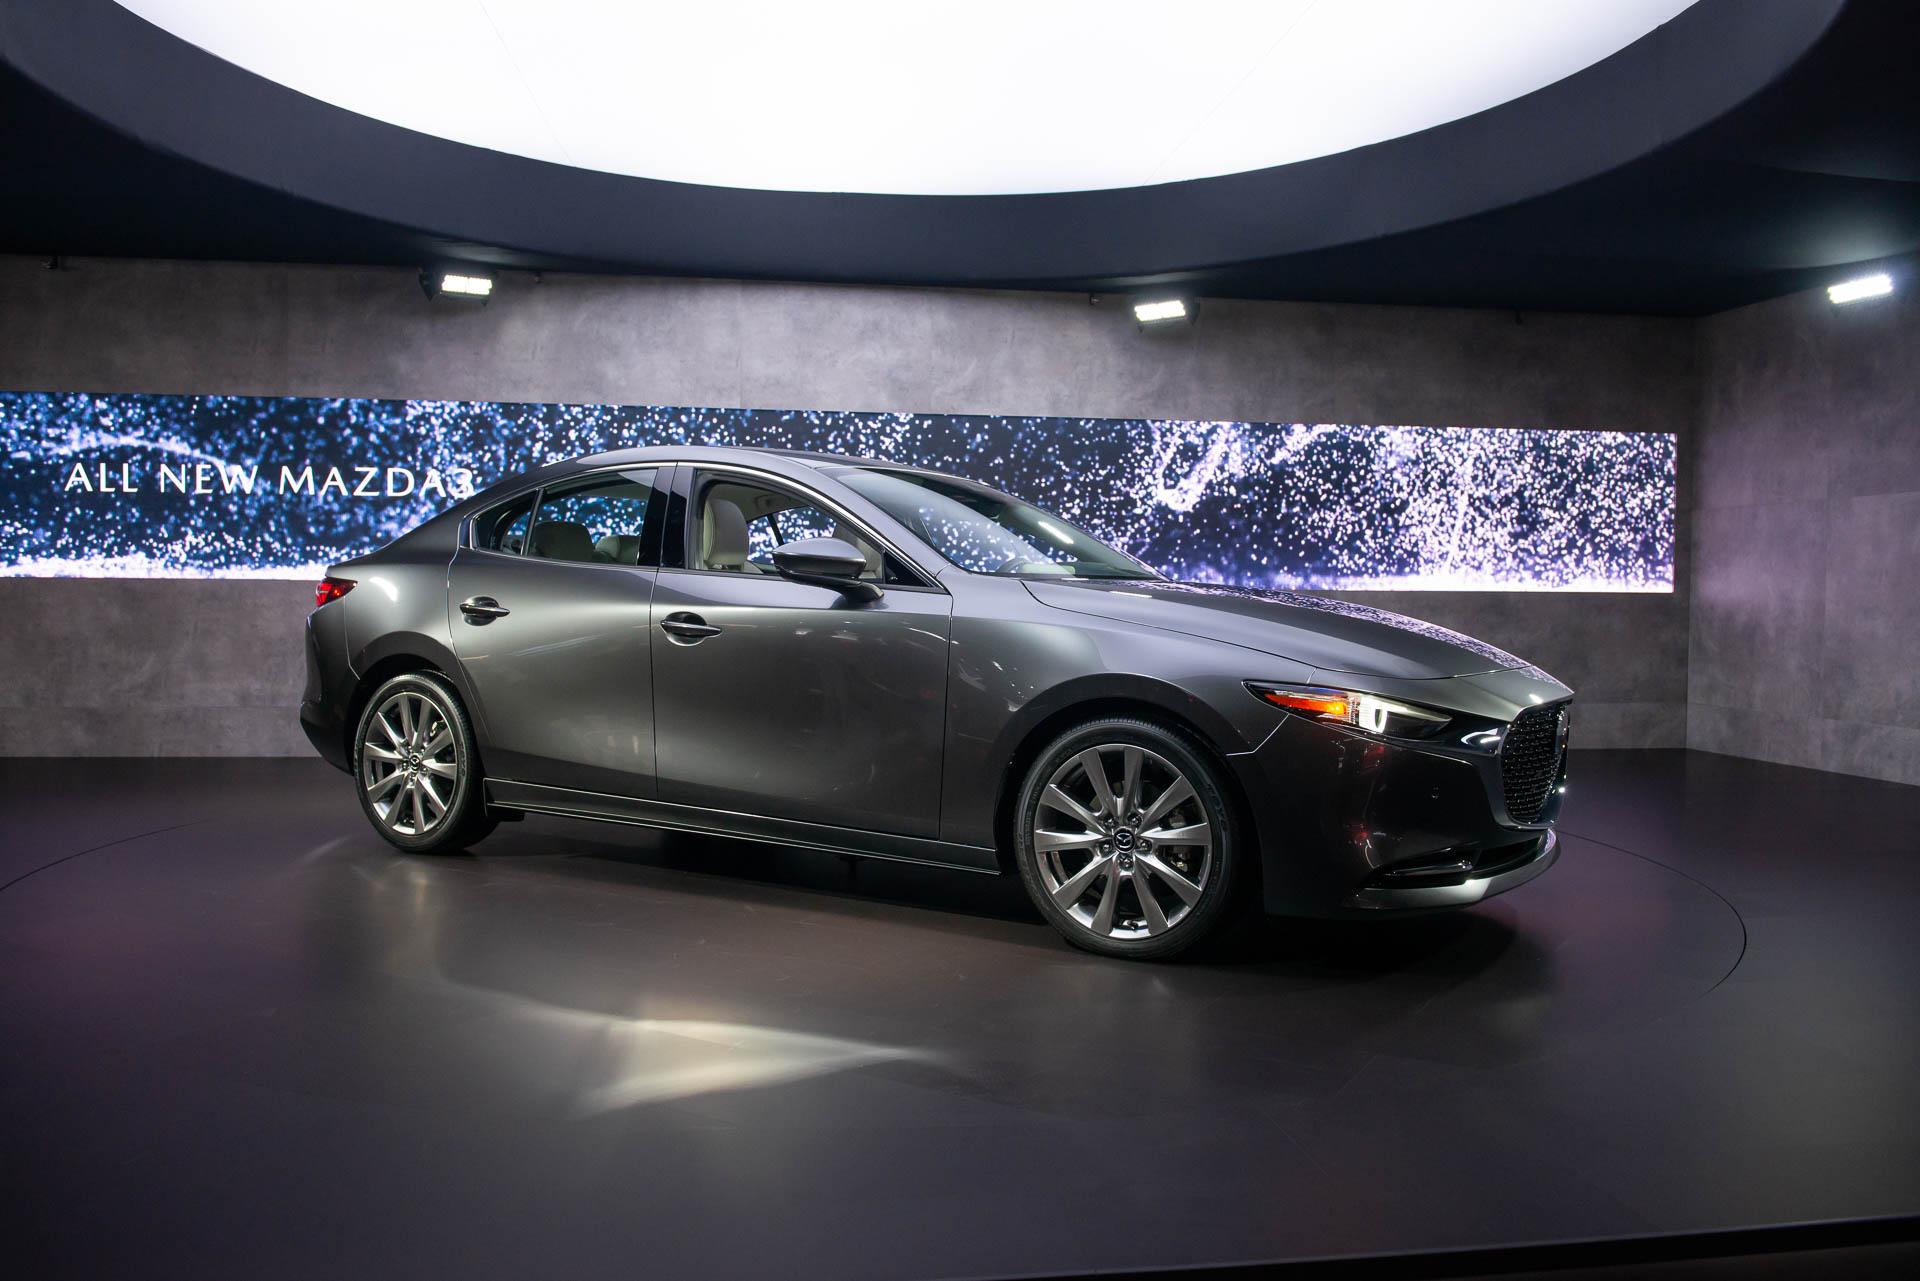 2019 Mazda 3 Brings Premium Look, Tech To Compact Segment